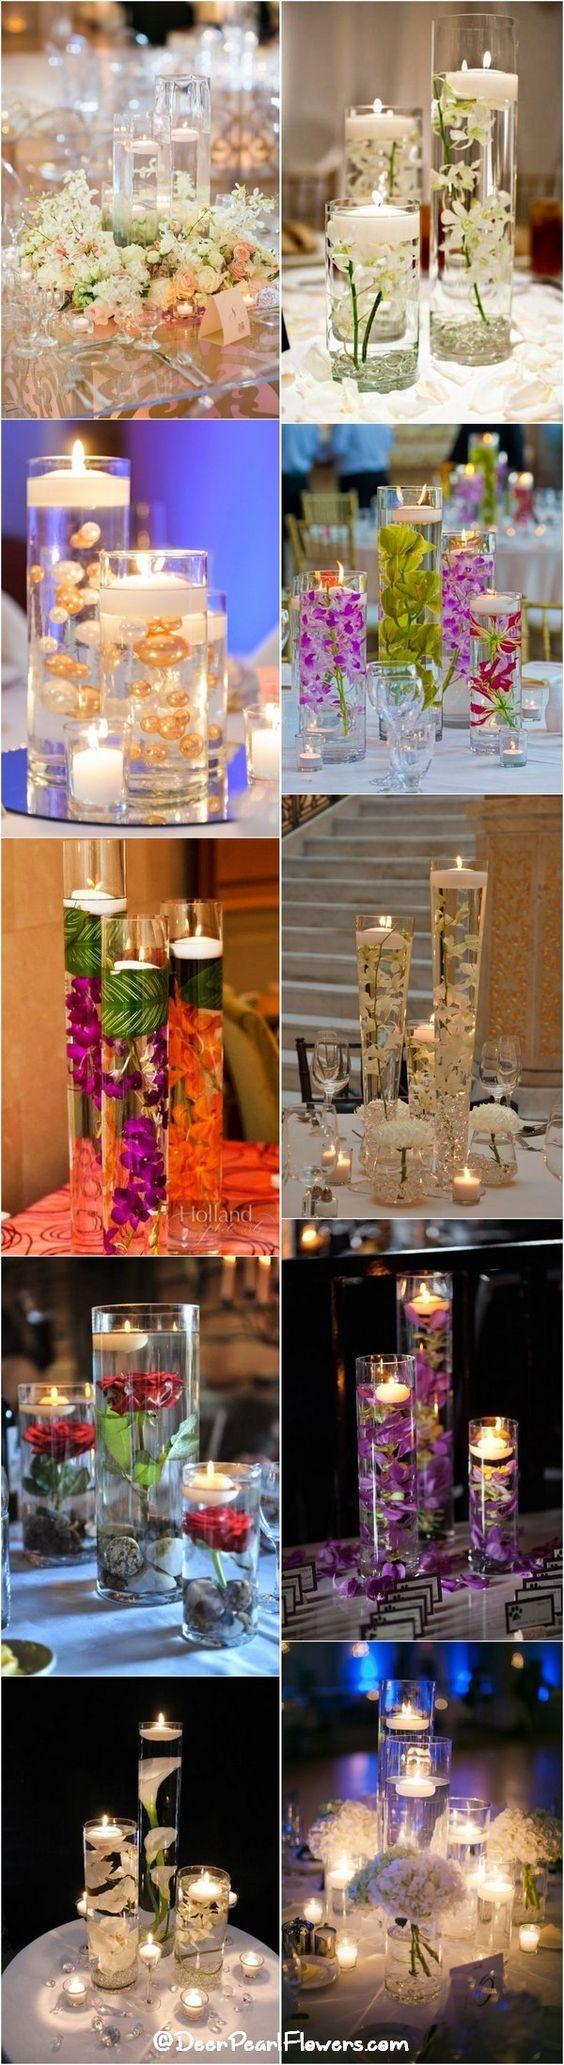 Romantic floating wedding centerpiece ideas / http://www.deerpearlflowers.com/floating-wedding-centerpieces/: